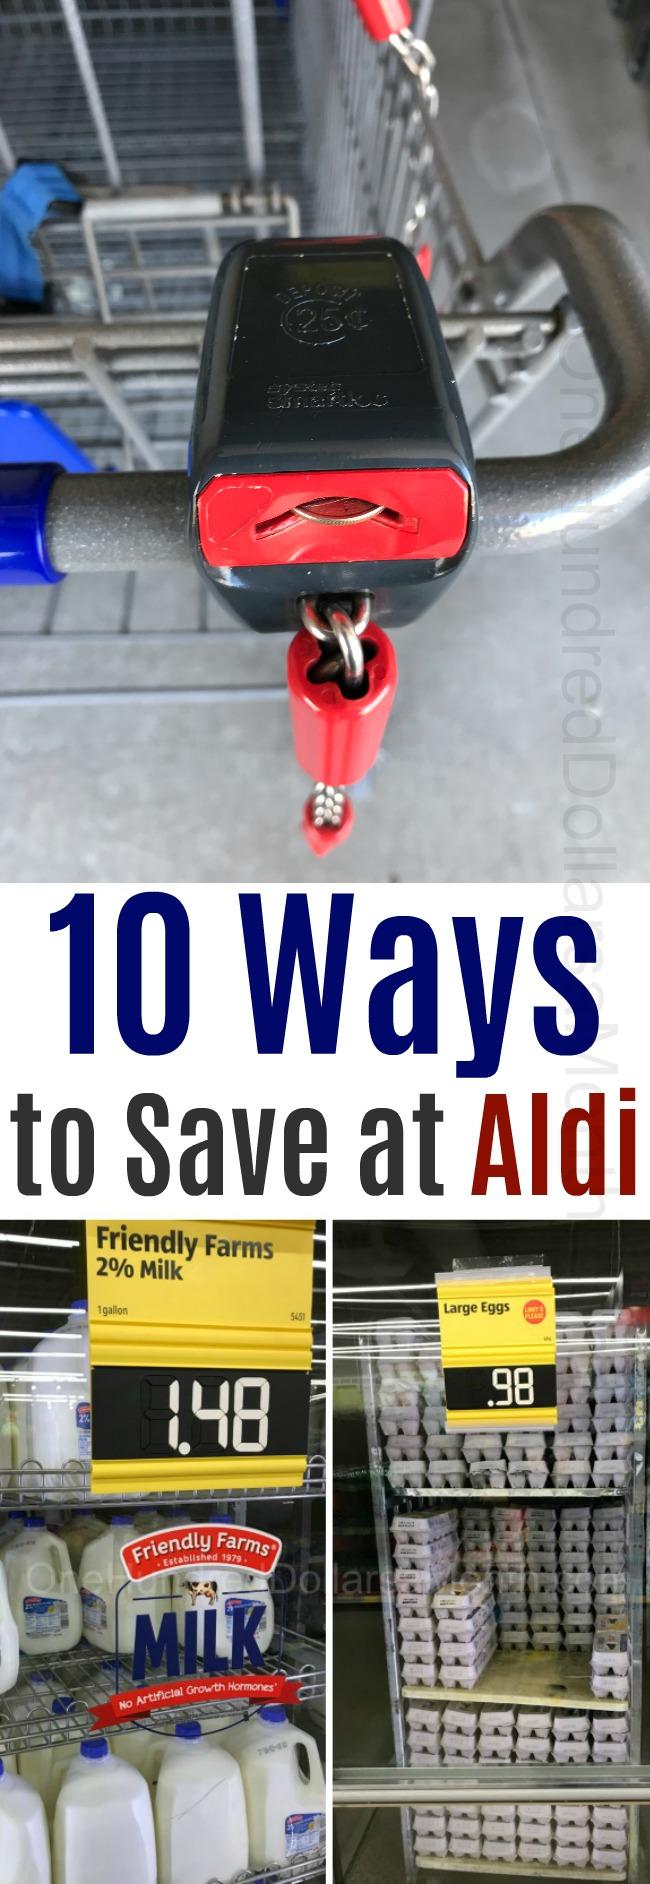 10 Ways to Save at Aldi